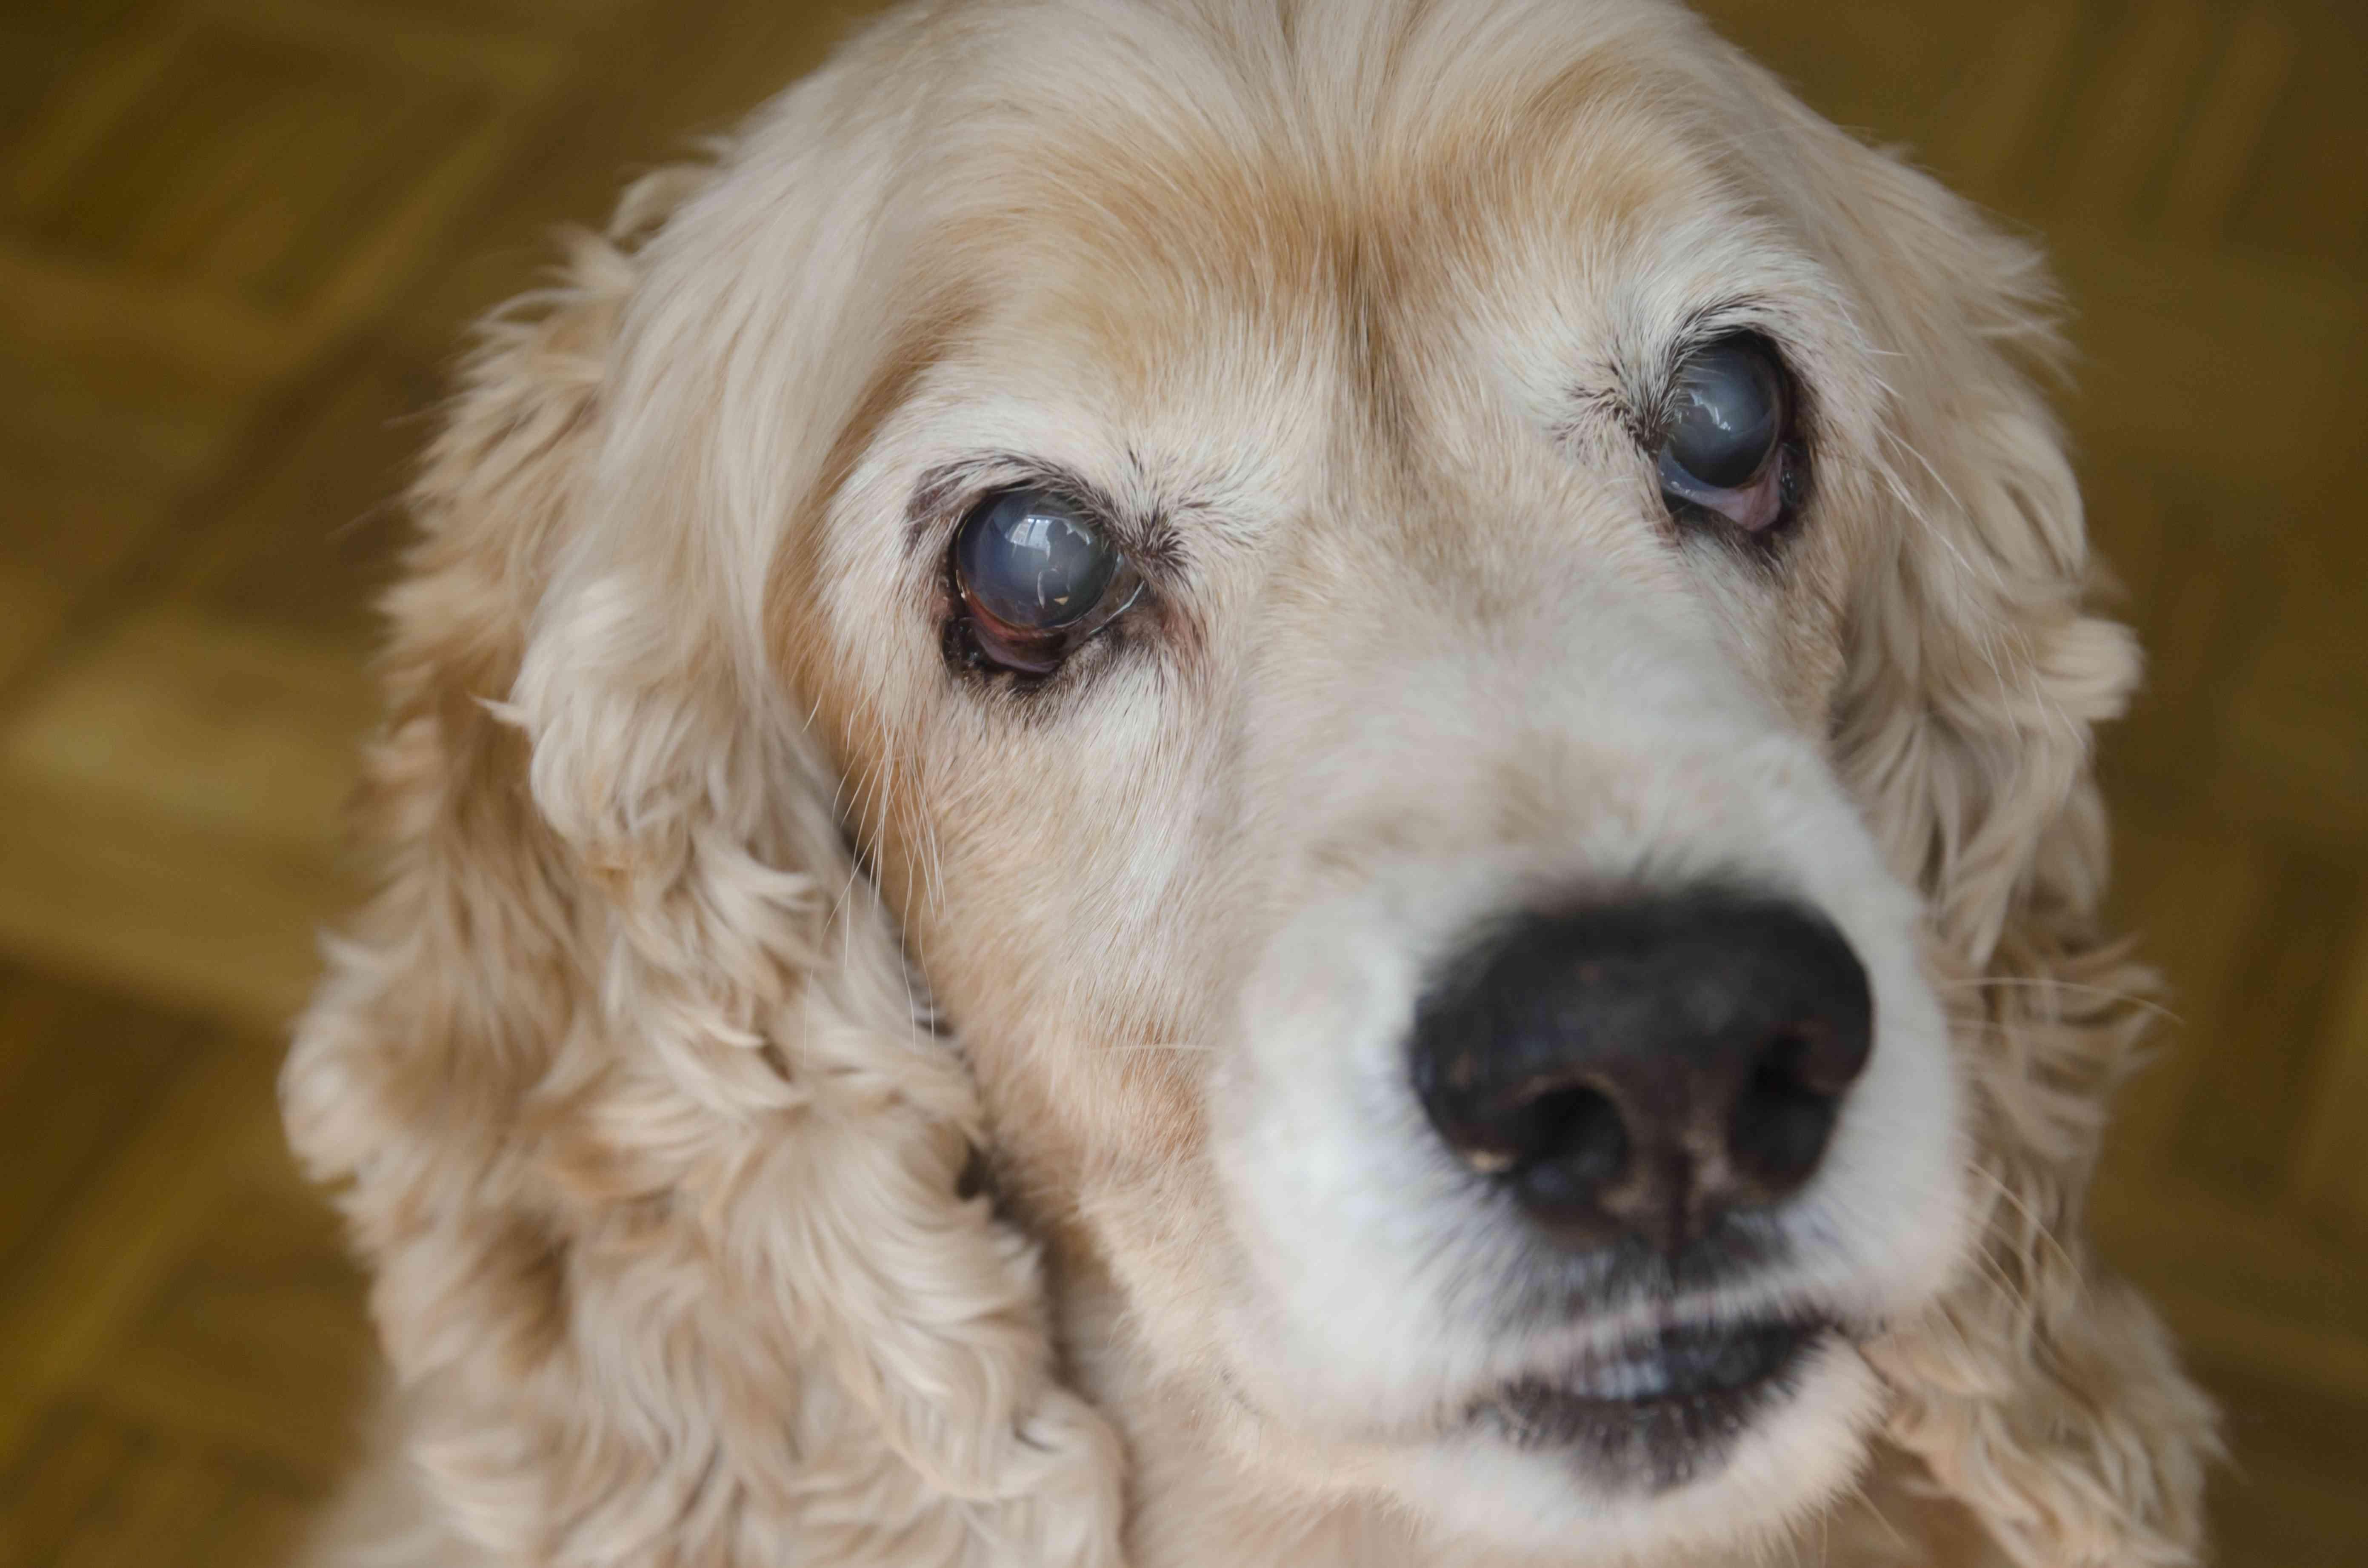 Blind senior dog, portrait